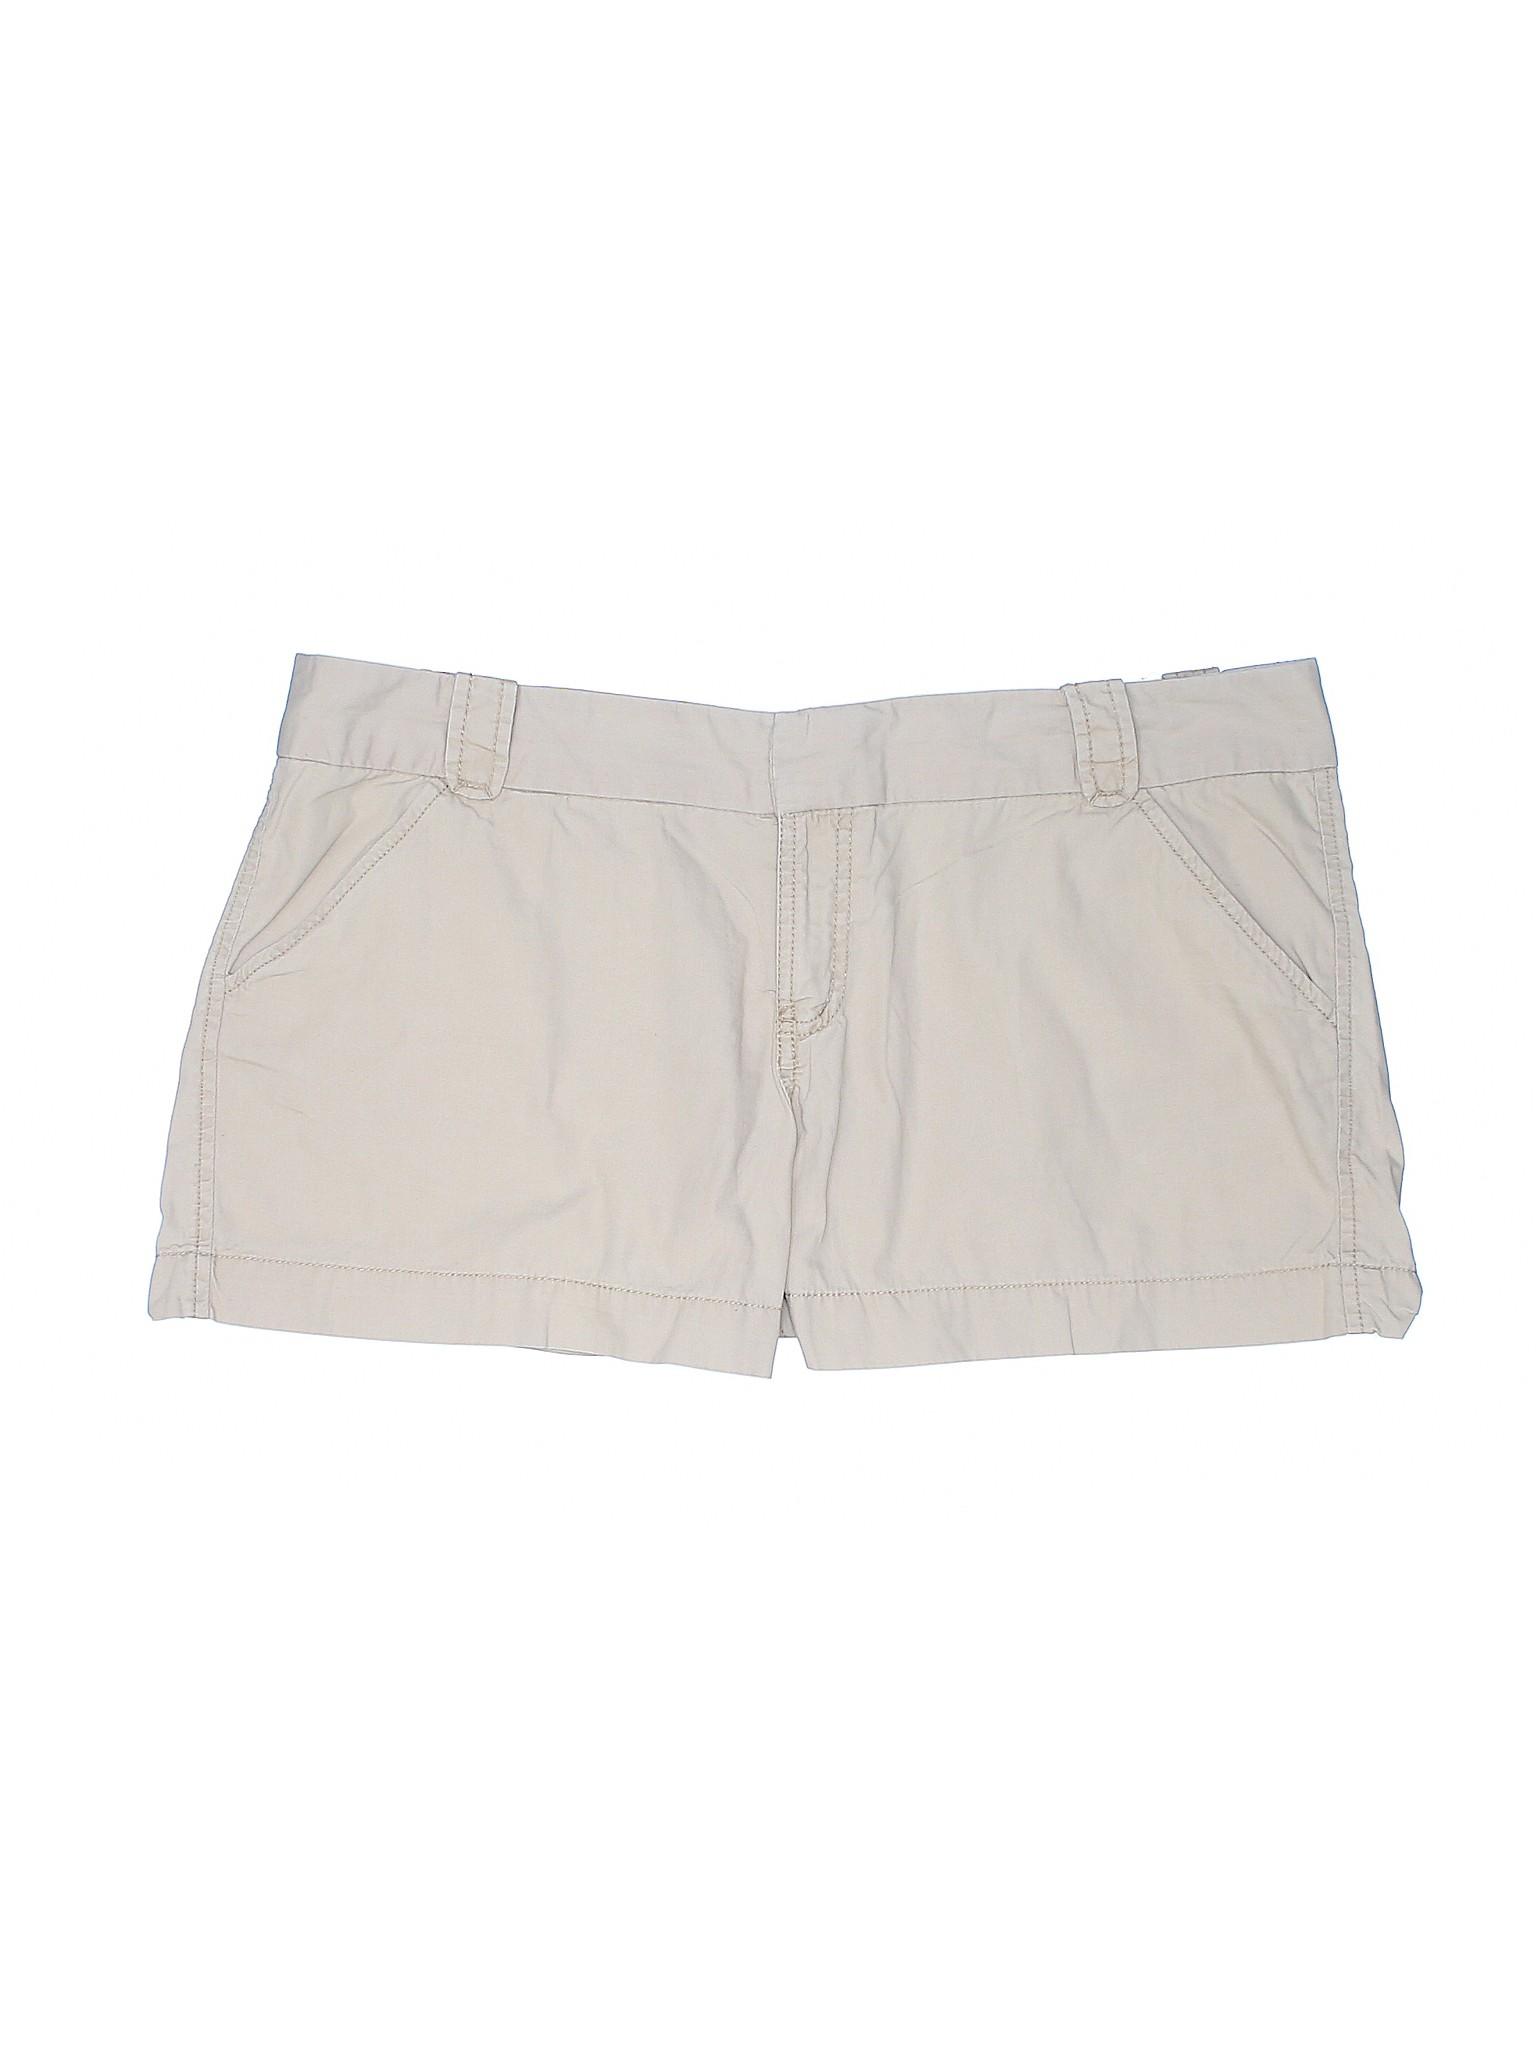 Leisure Navy Old Shorts Khaki winter 0rqF1xw0